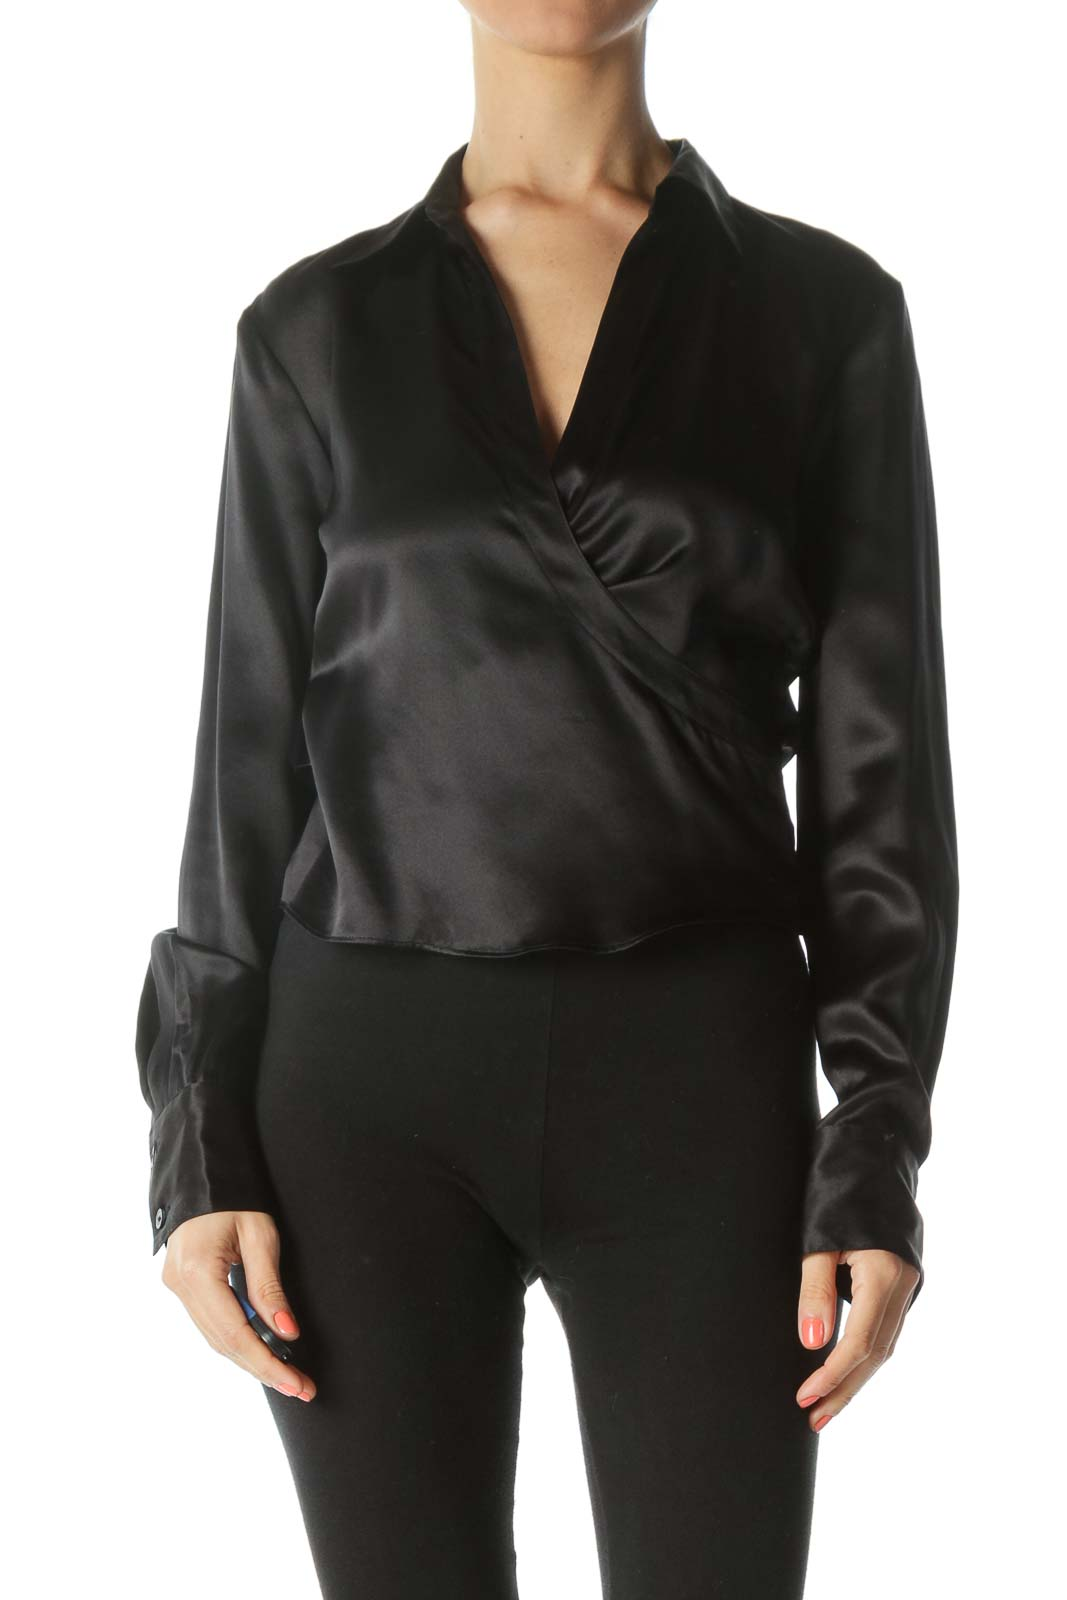 Black 100% Silk Wrap Shiny Long-Sleeve Top